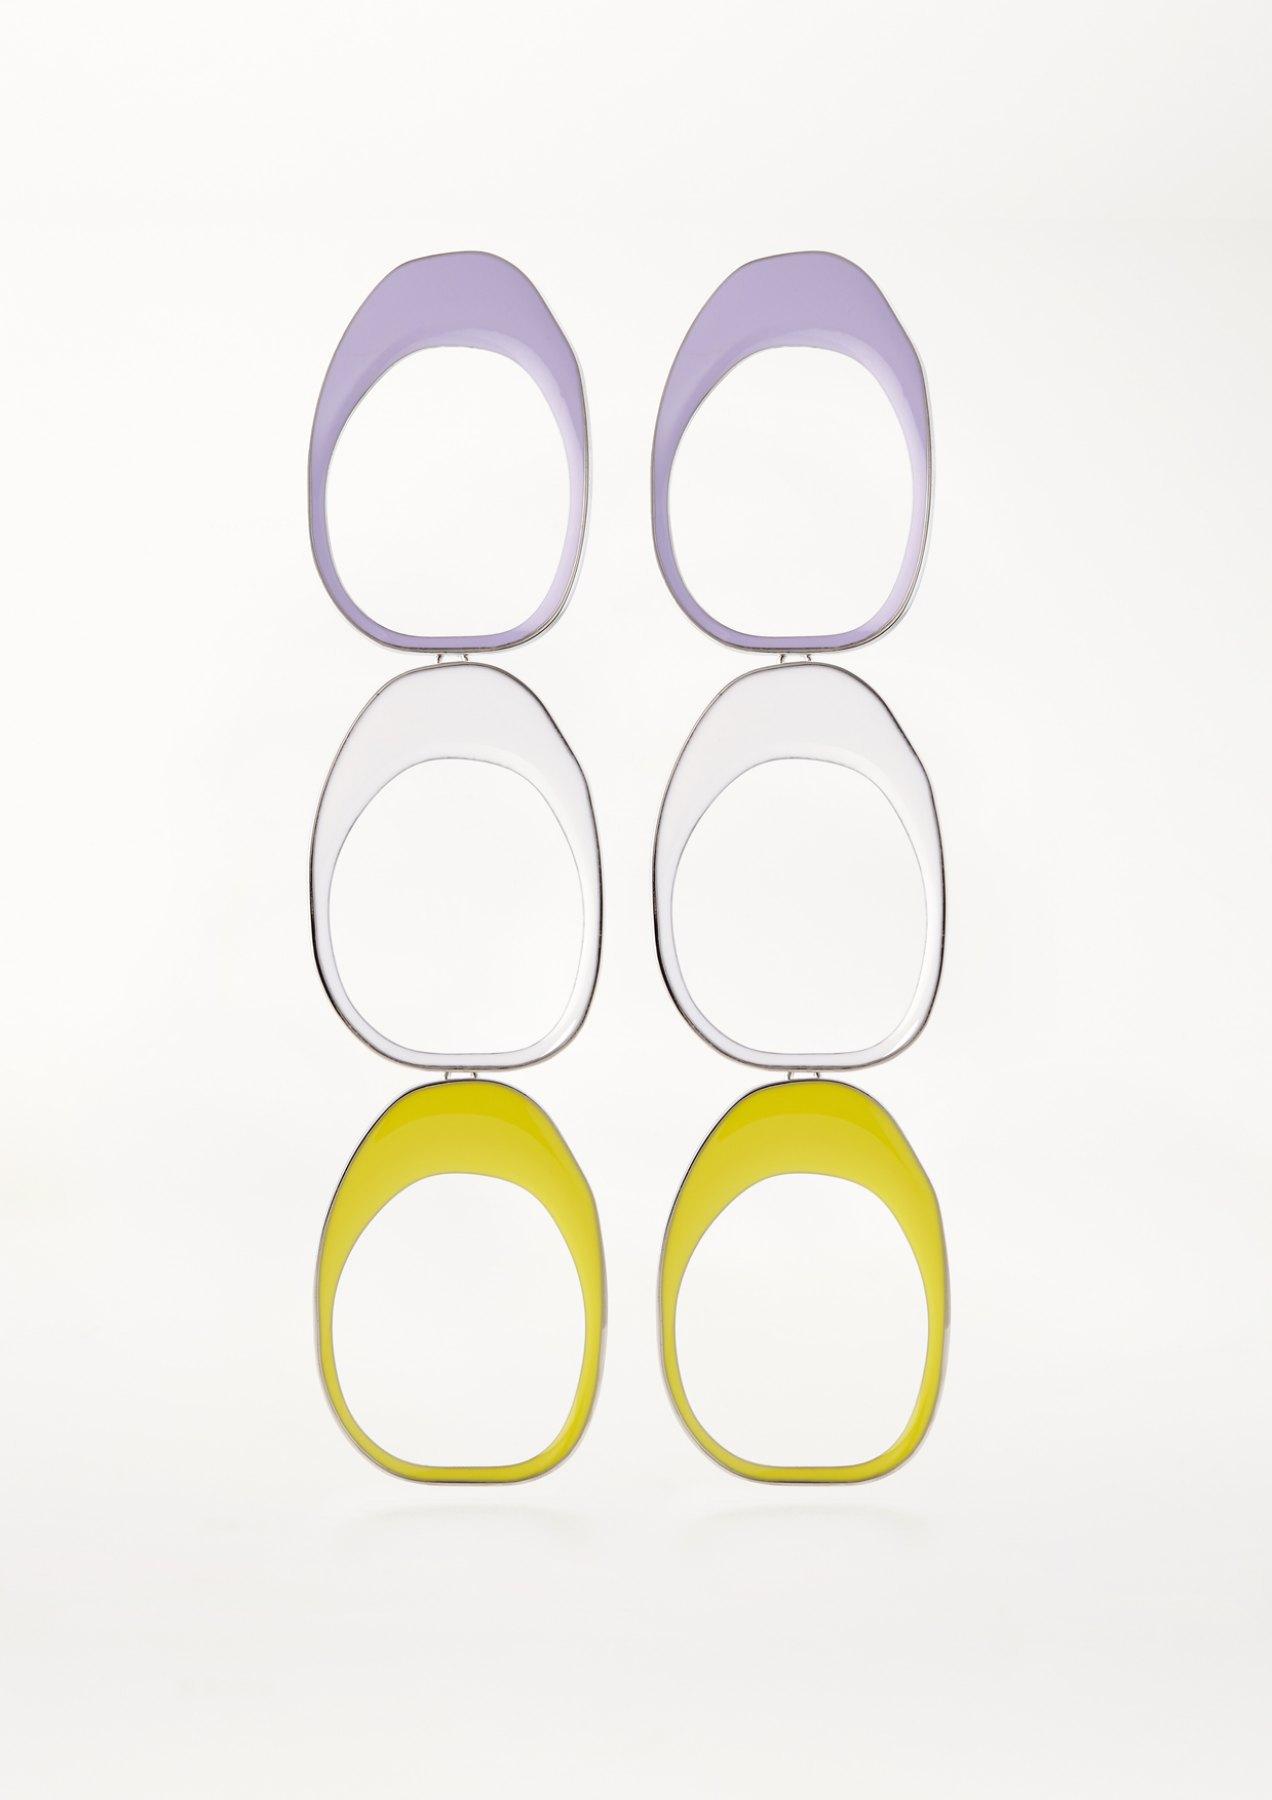 xenia bous jewellery coloured stone 03 earrings multicolour flieder weiß gelb